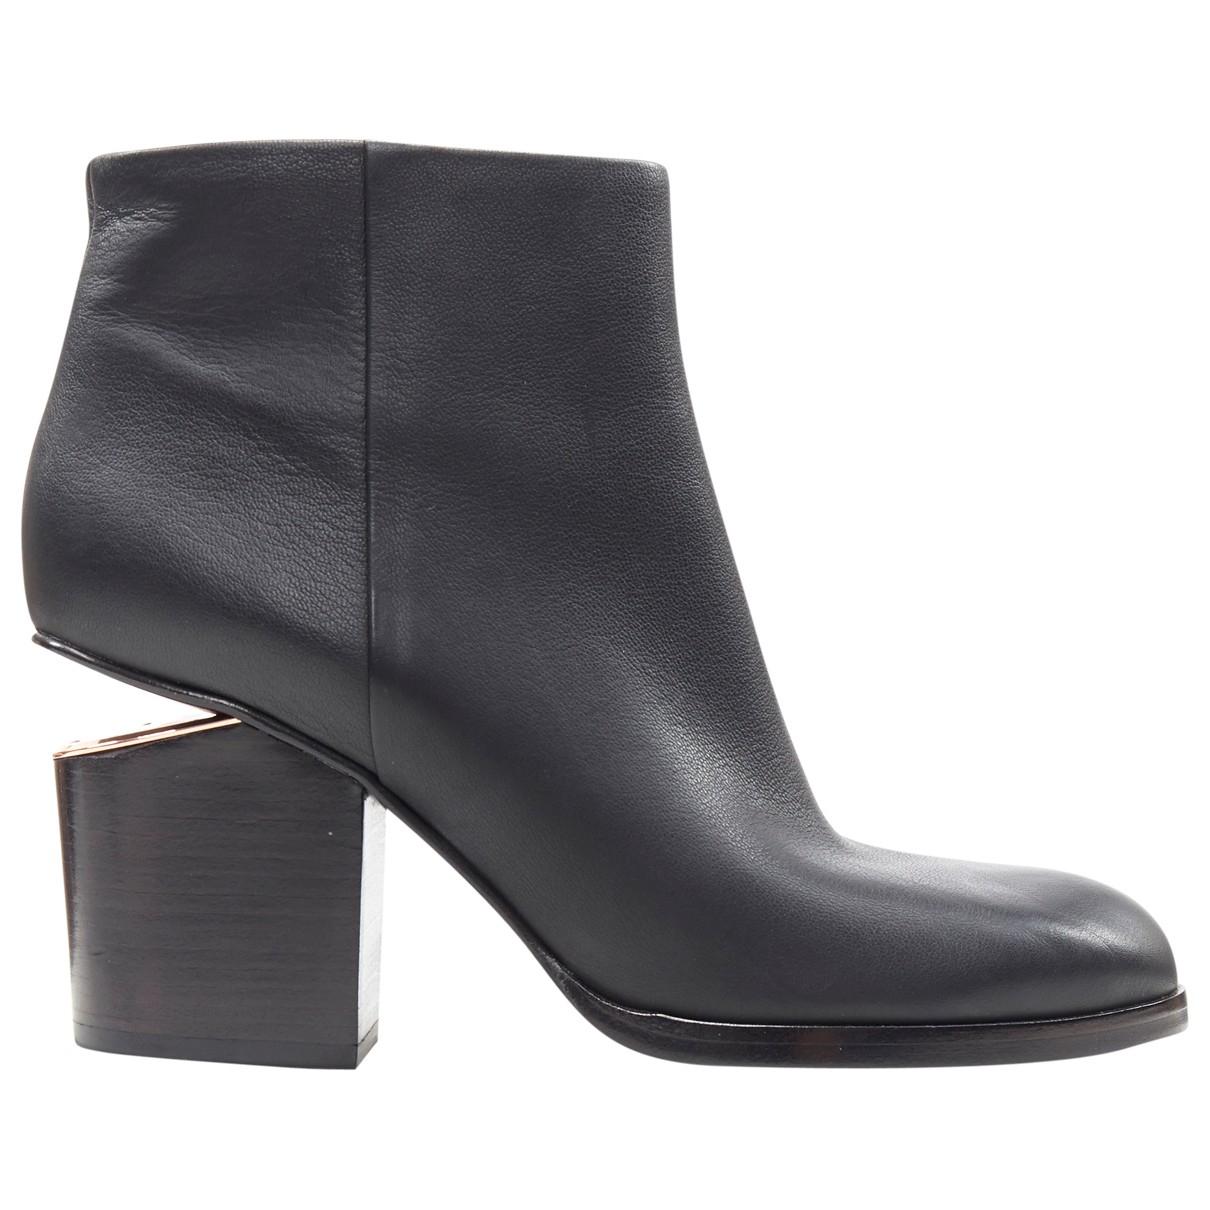 Alexander Wang - Boots   pour femme en cuir - noir